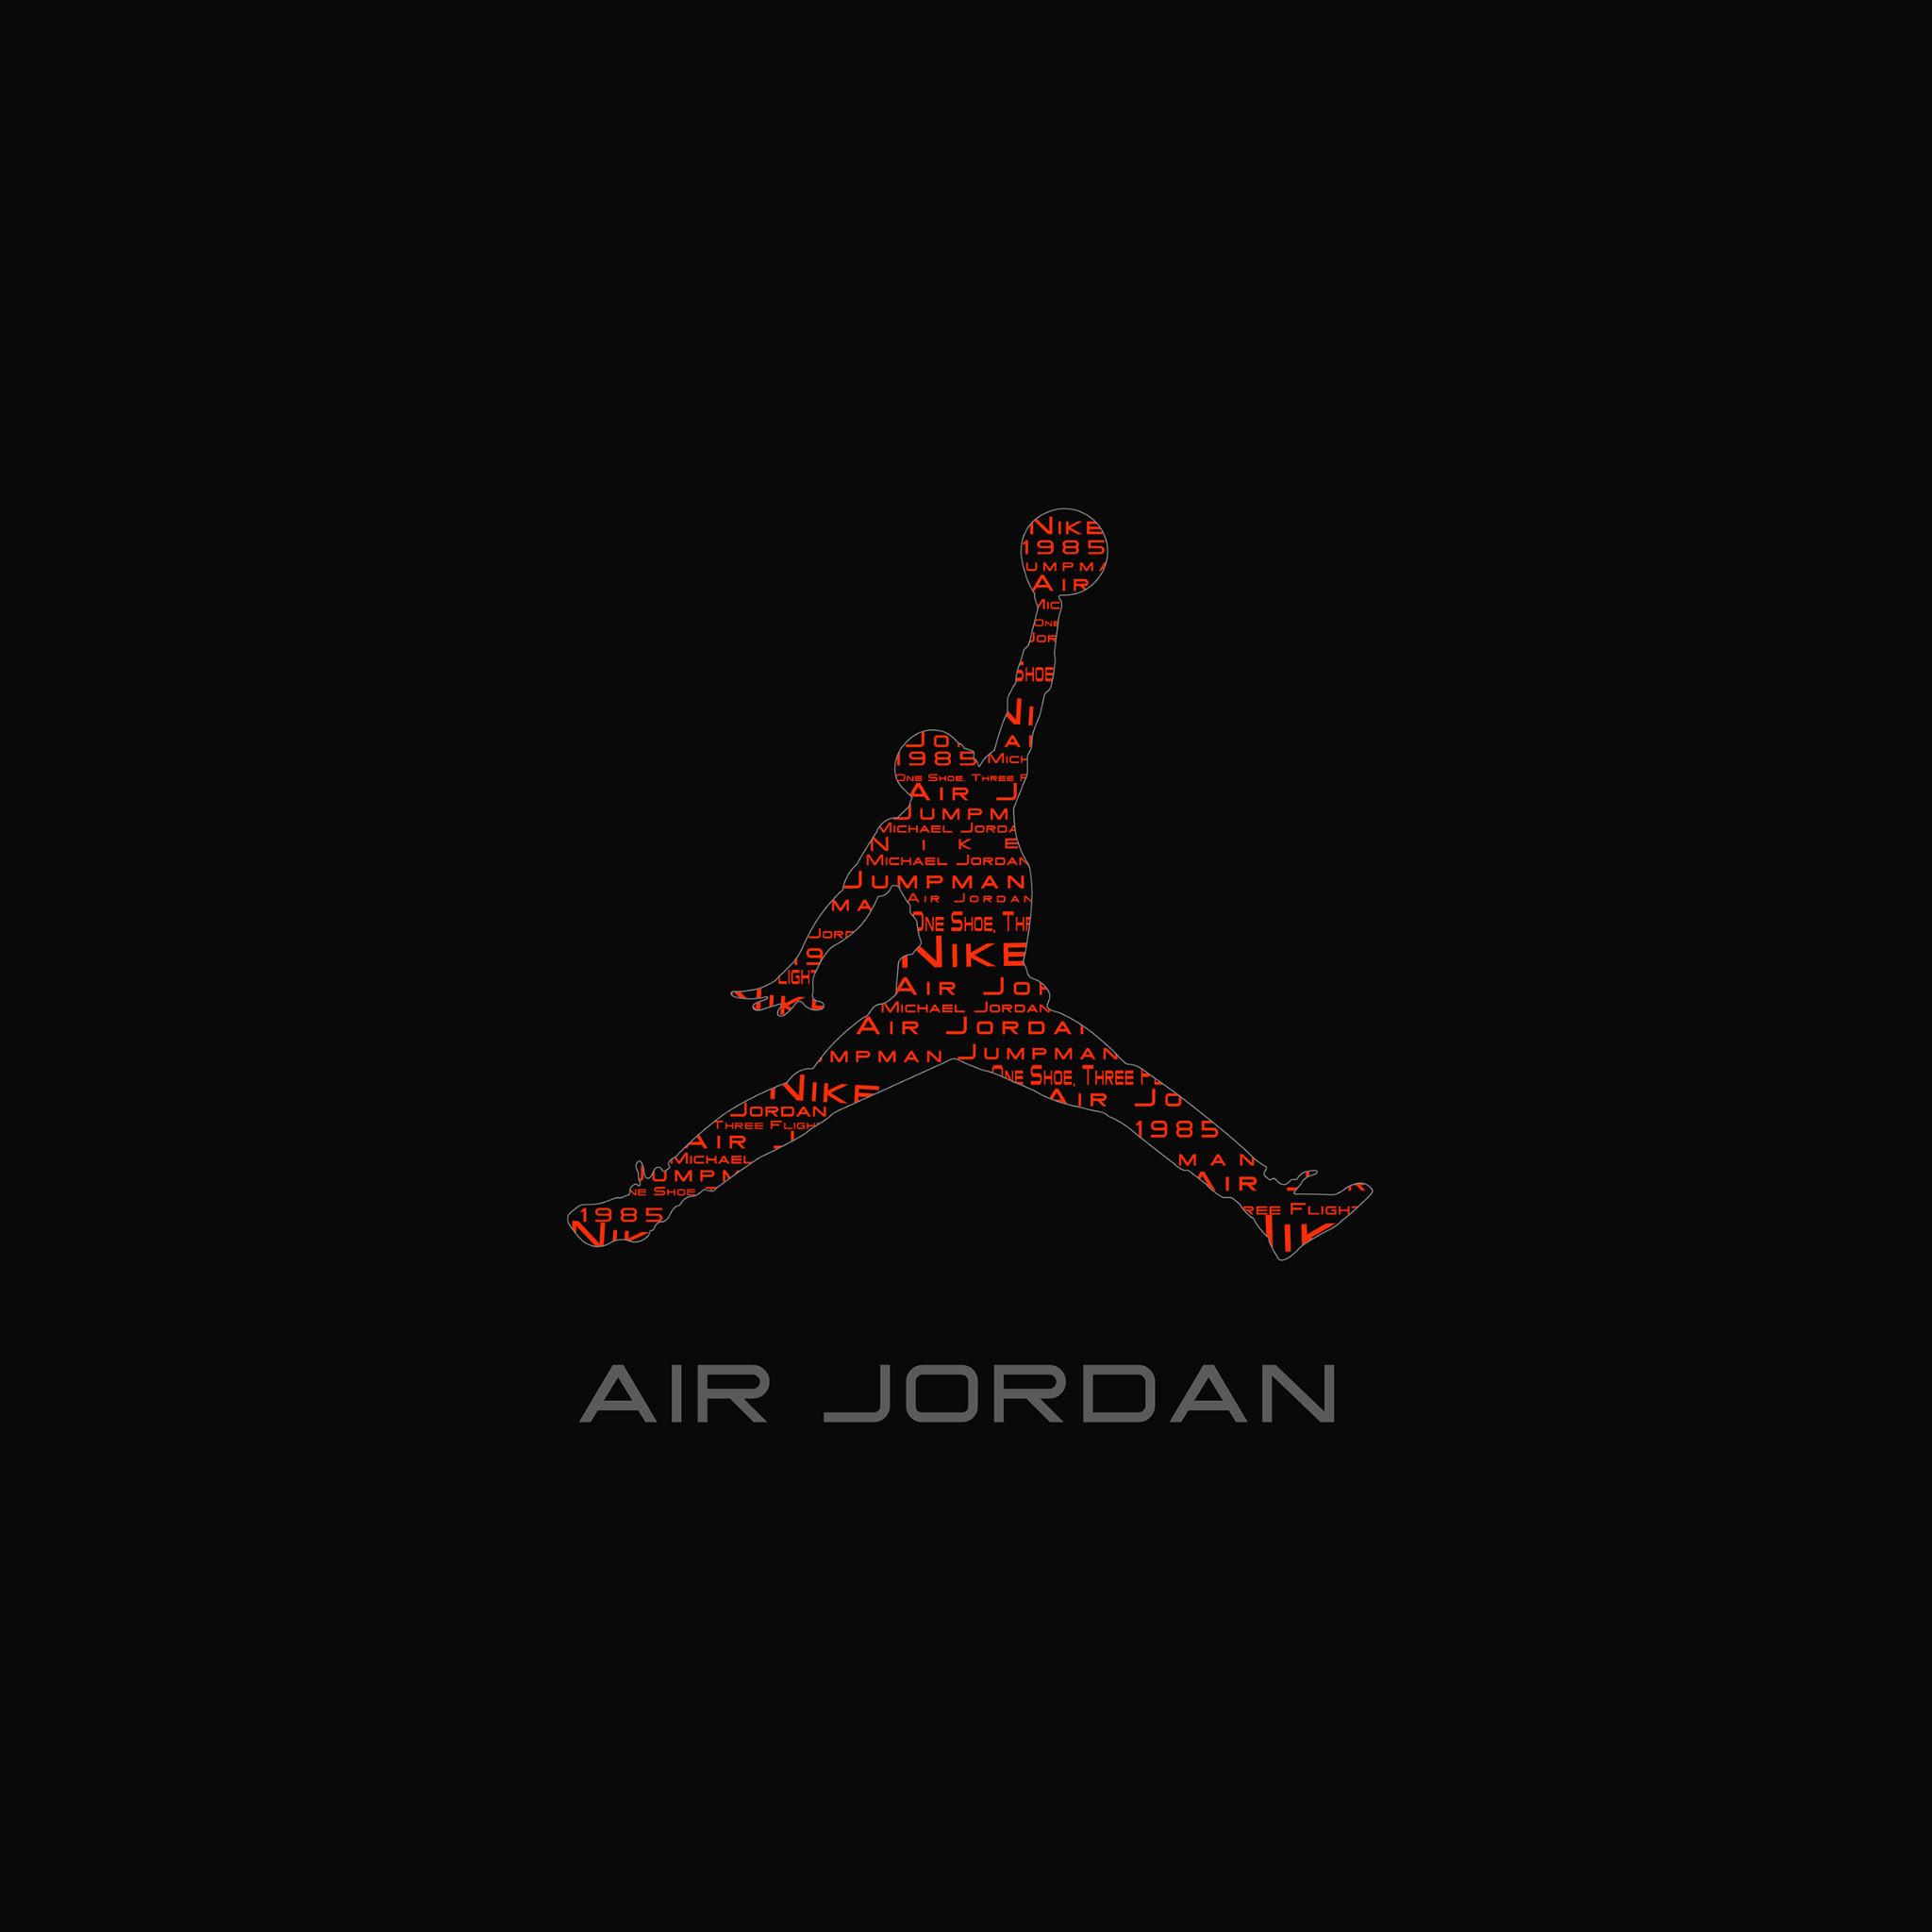 1080x1920 michael jordan wallpaper iphone 6